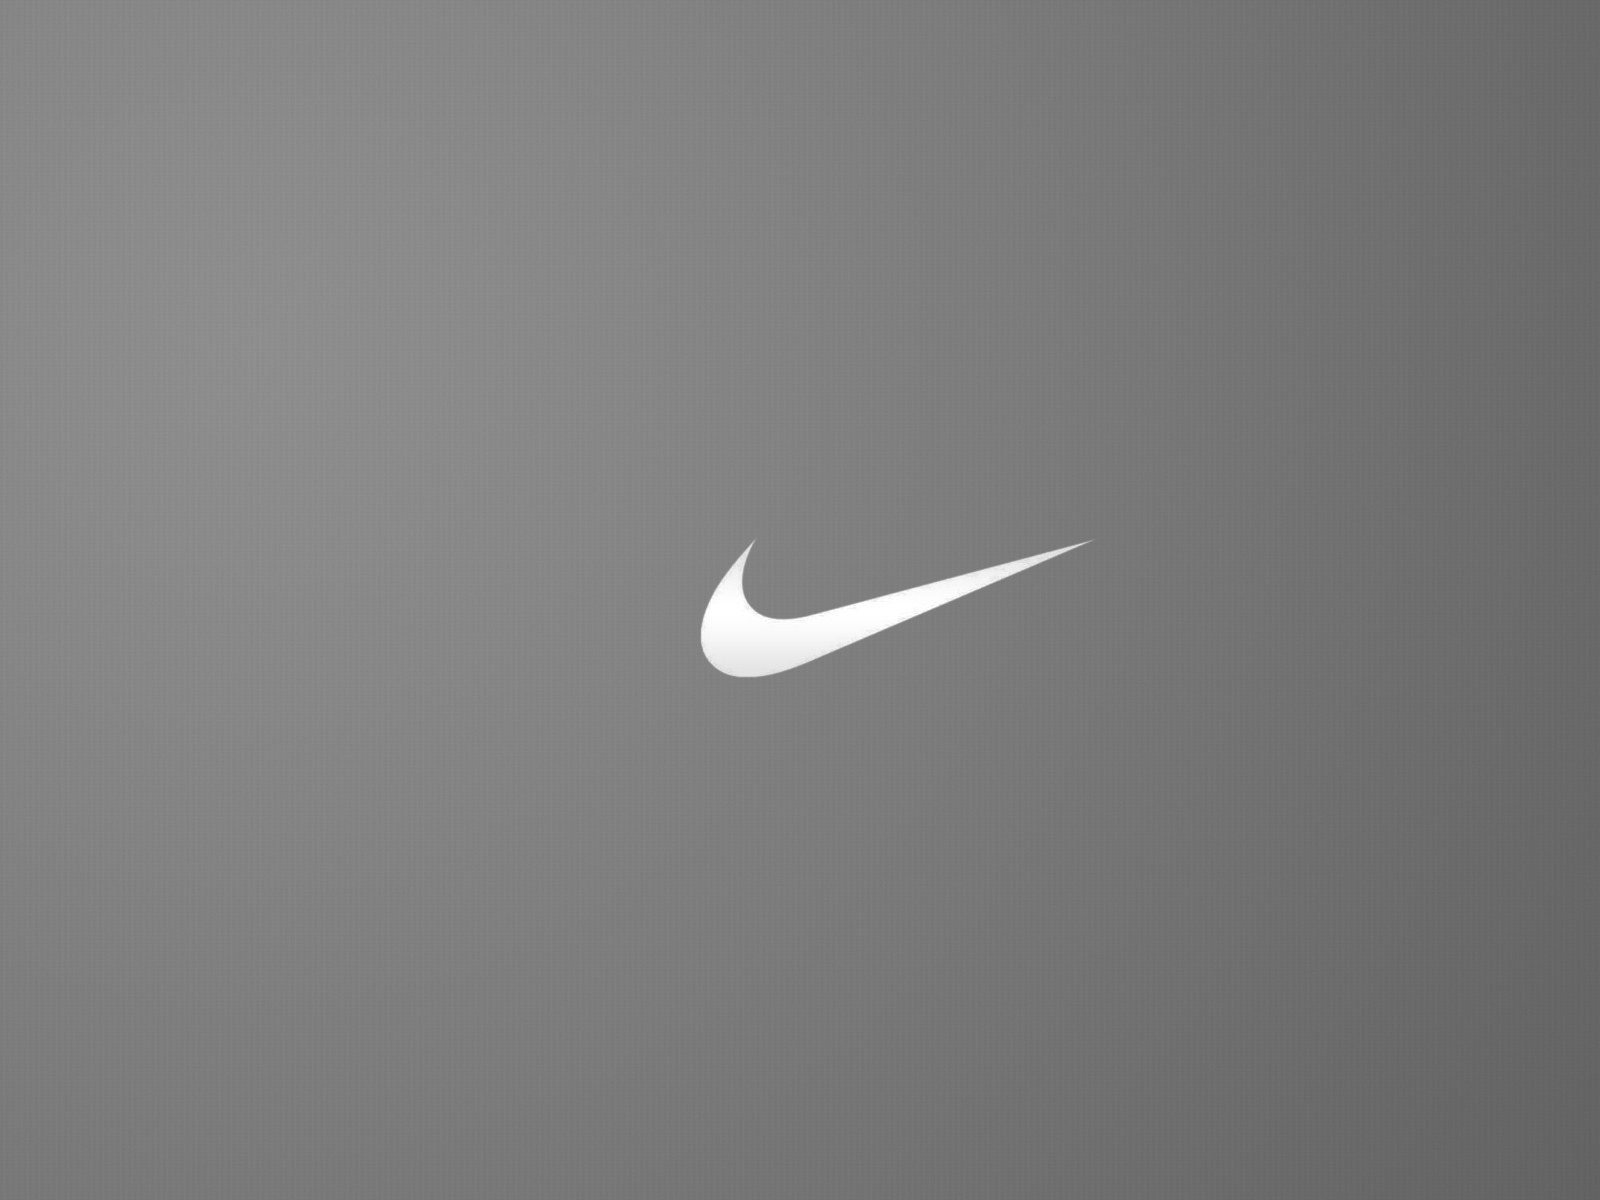 Logo nike wallpaper wallpapersafari - Nike Logo Greyscale Minimal Hd Wallpaper Nike Tick Logo By Tie Nike